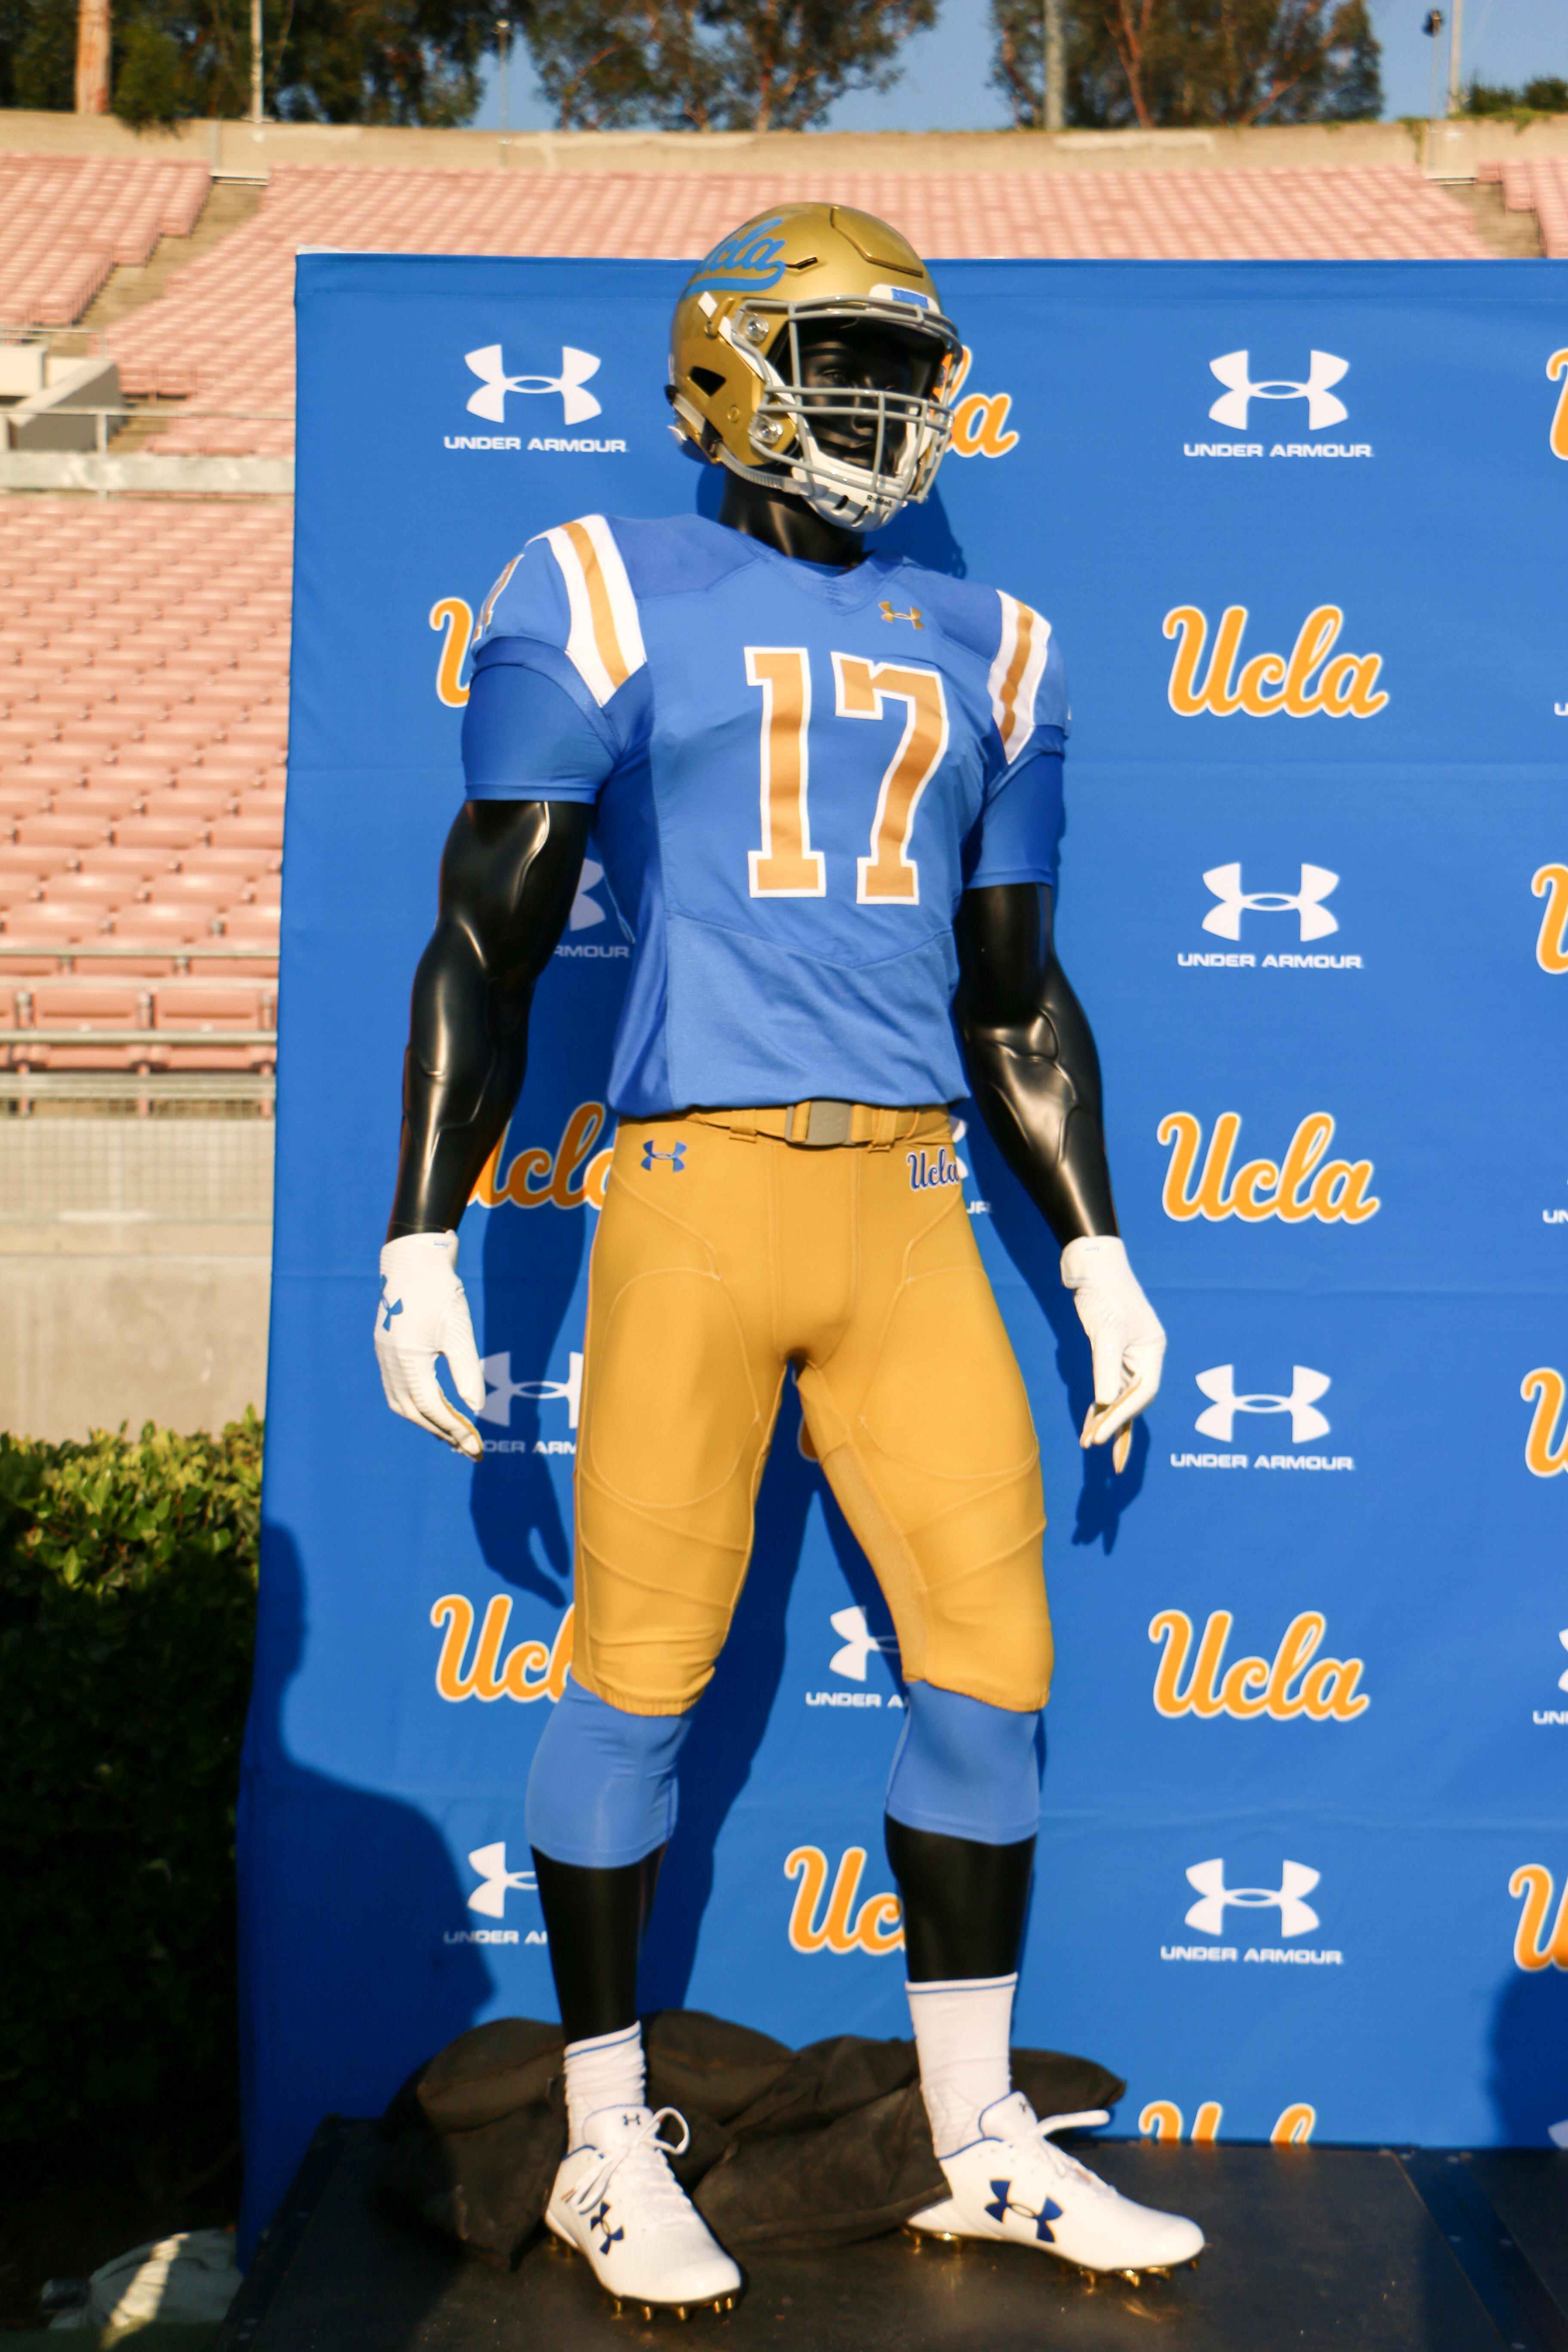 ab37b19c60b UCLA Football Season Ticket Holders Get a Look at the Under Armour ...